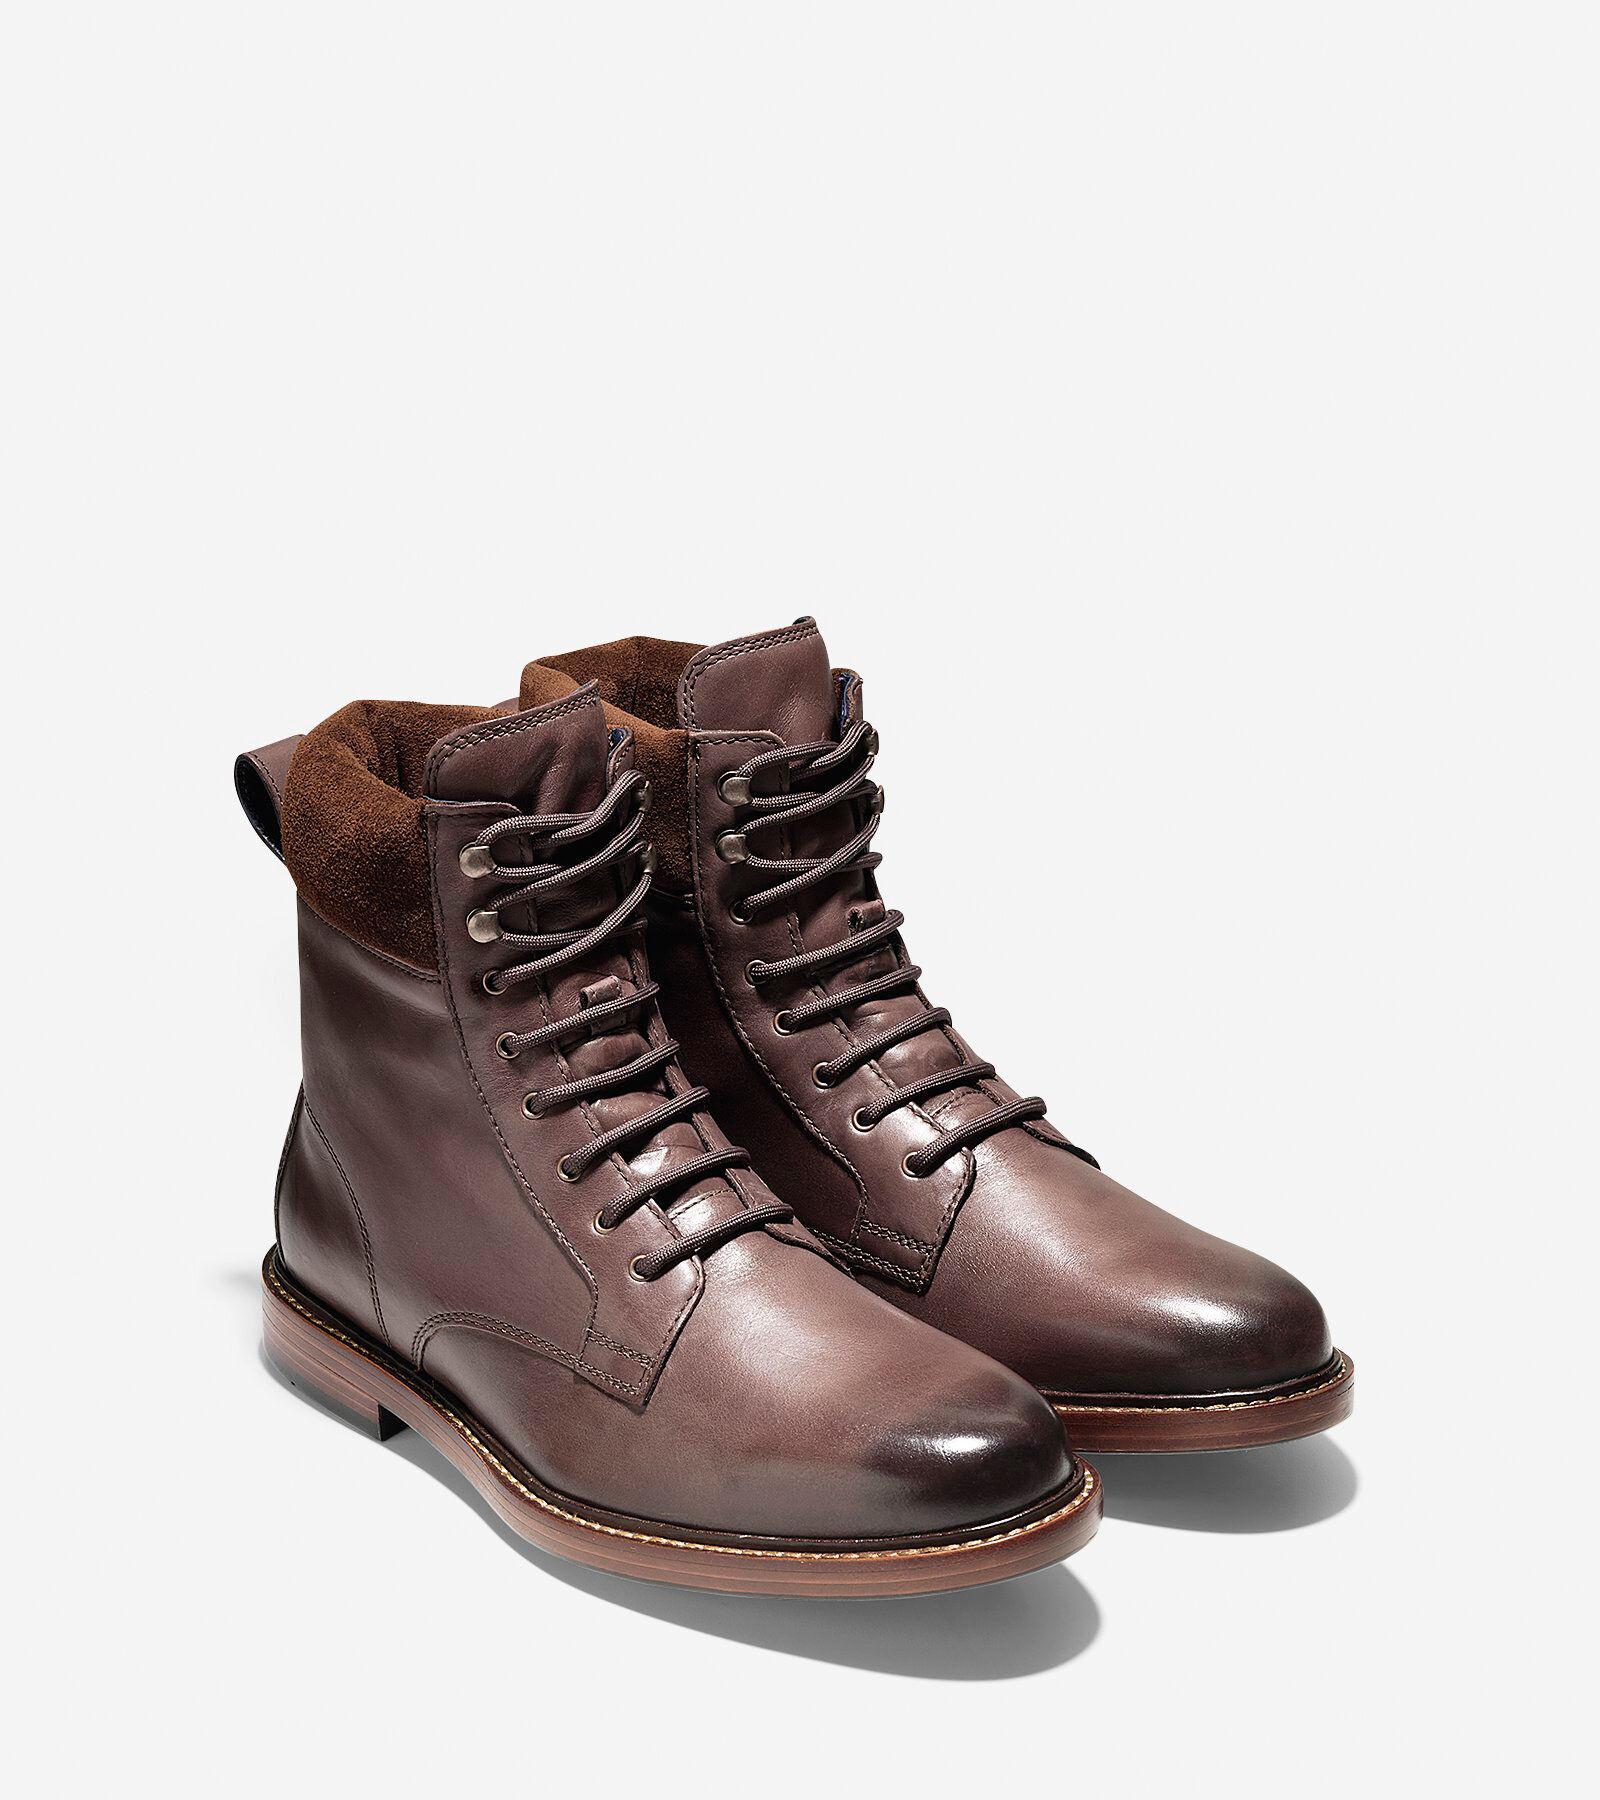 Tyler Grand Boot Cole Haan oFuXN6da